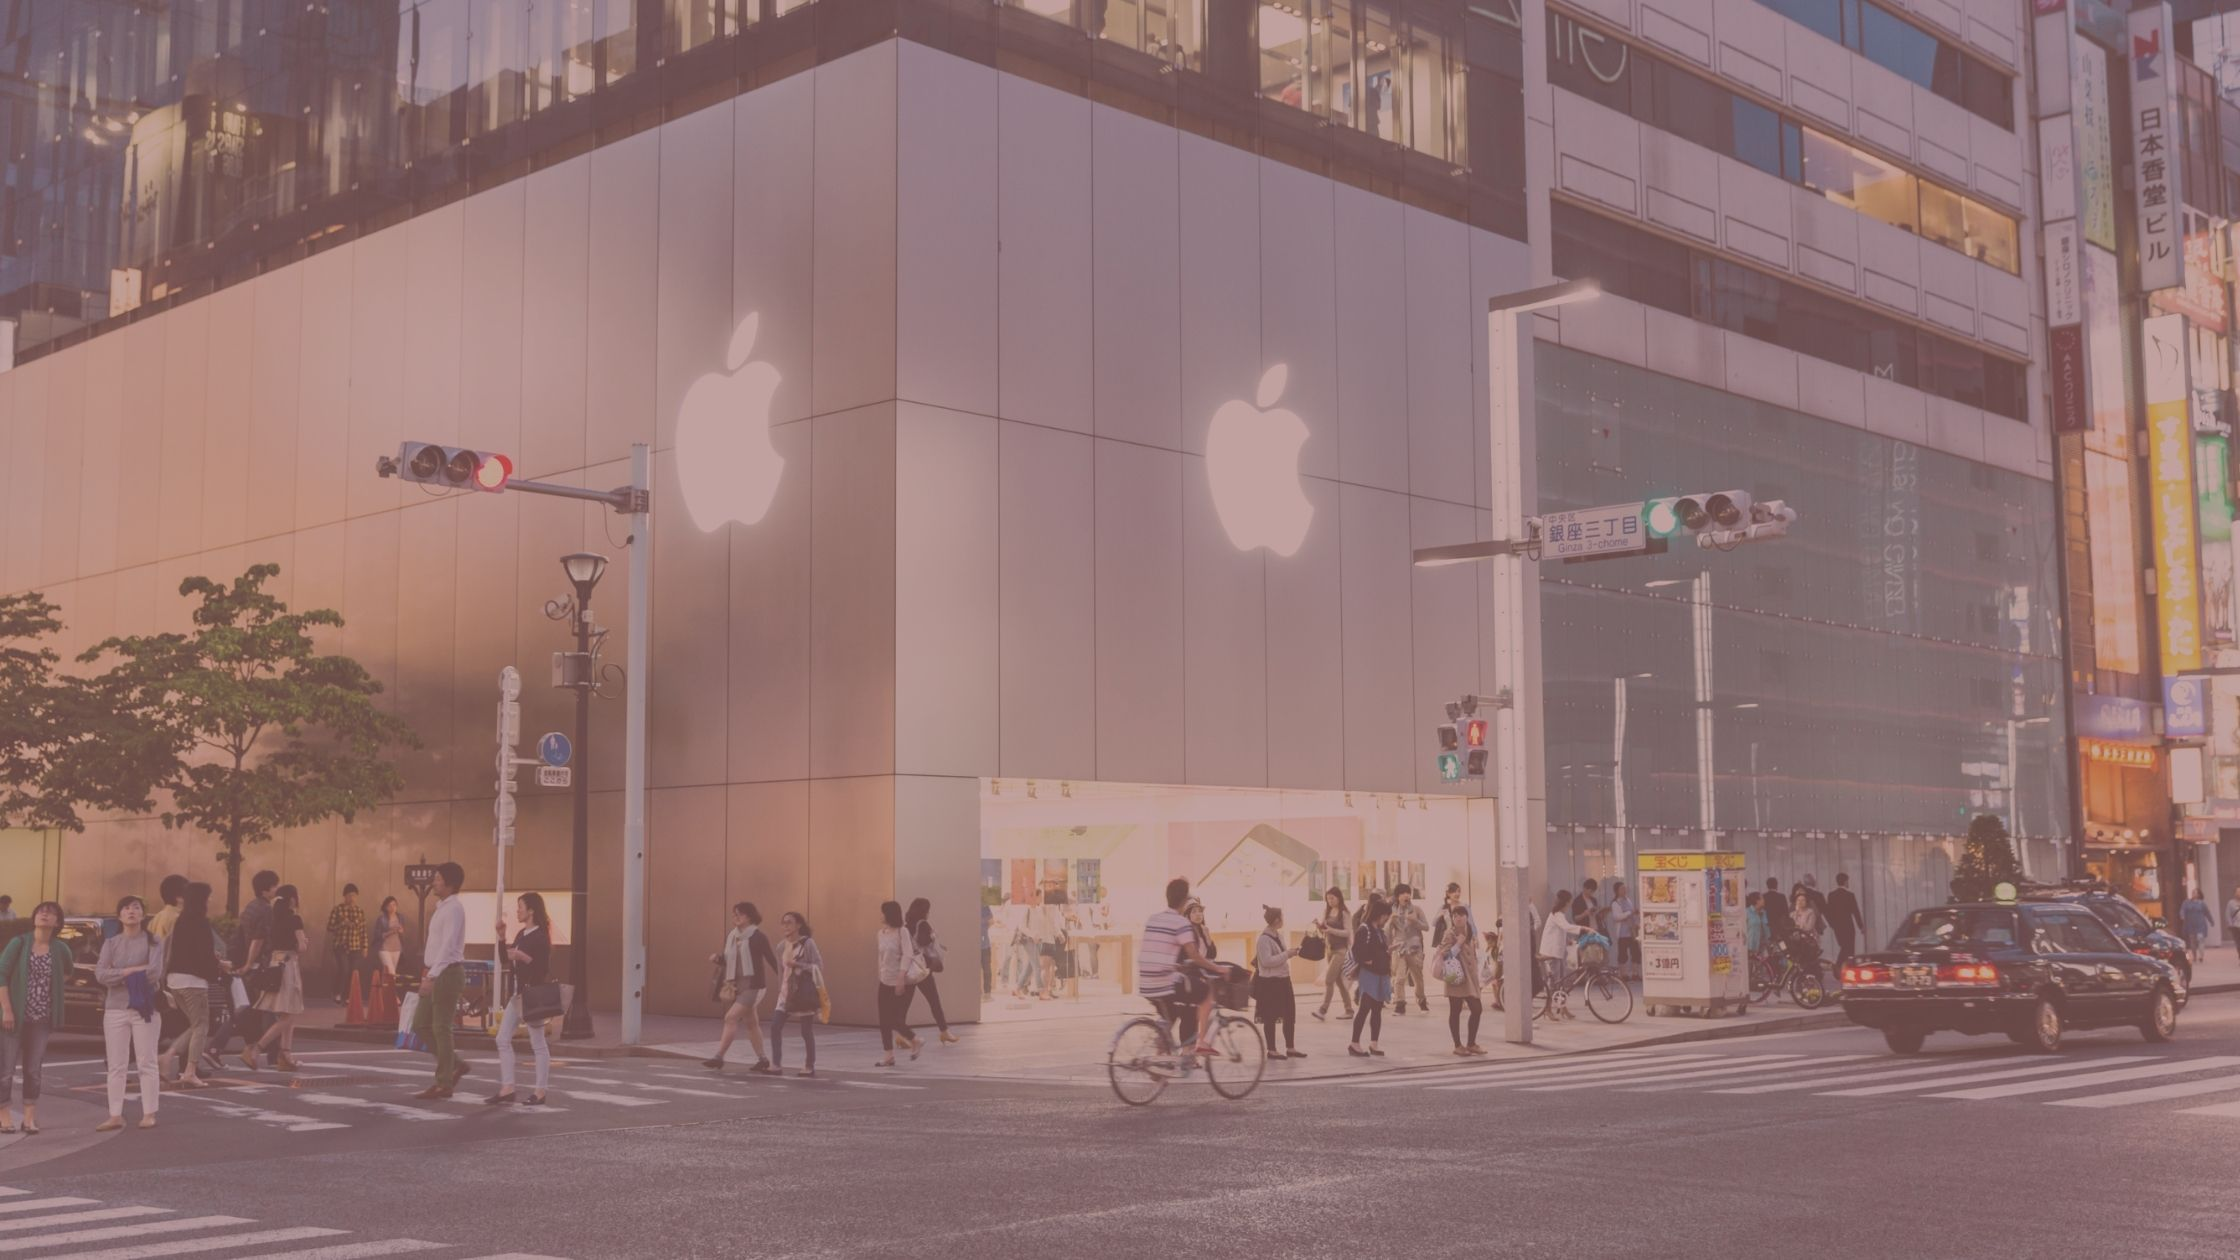 Apple Menjadi Trendsetter Tidak Menyertakan Pengisian Daya Pada Kotak Penjualan